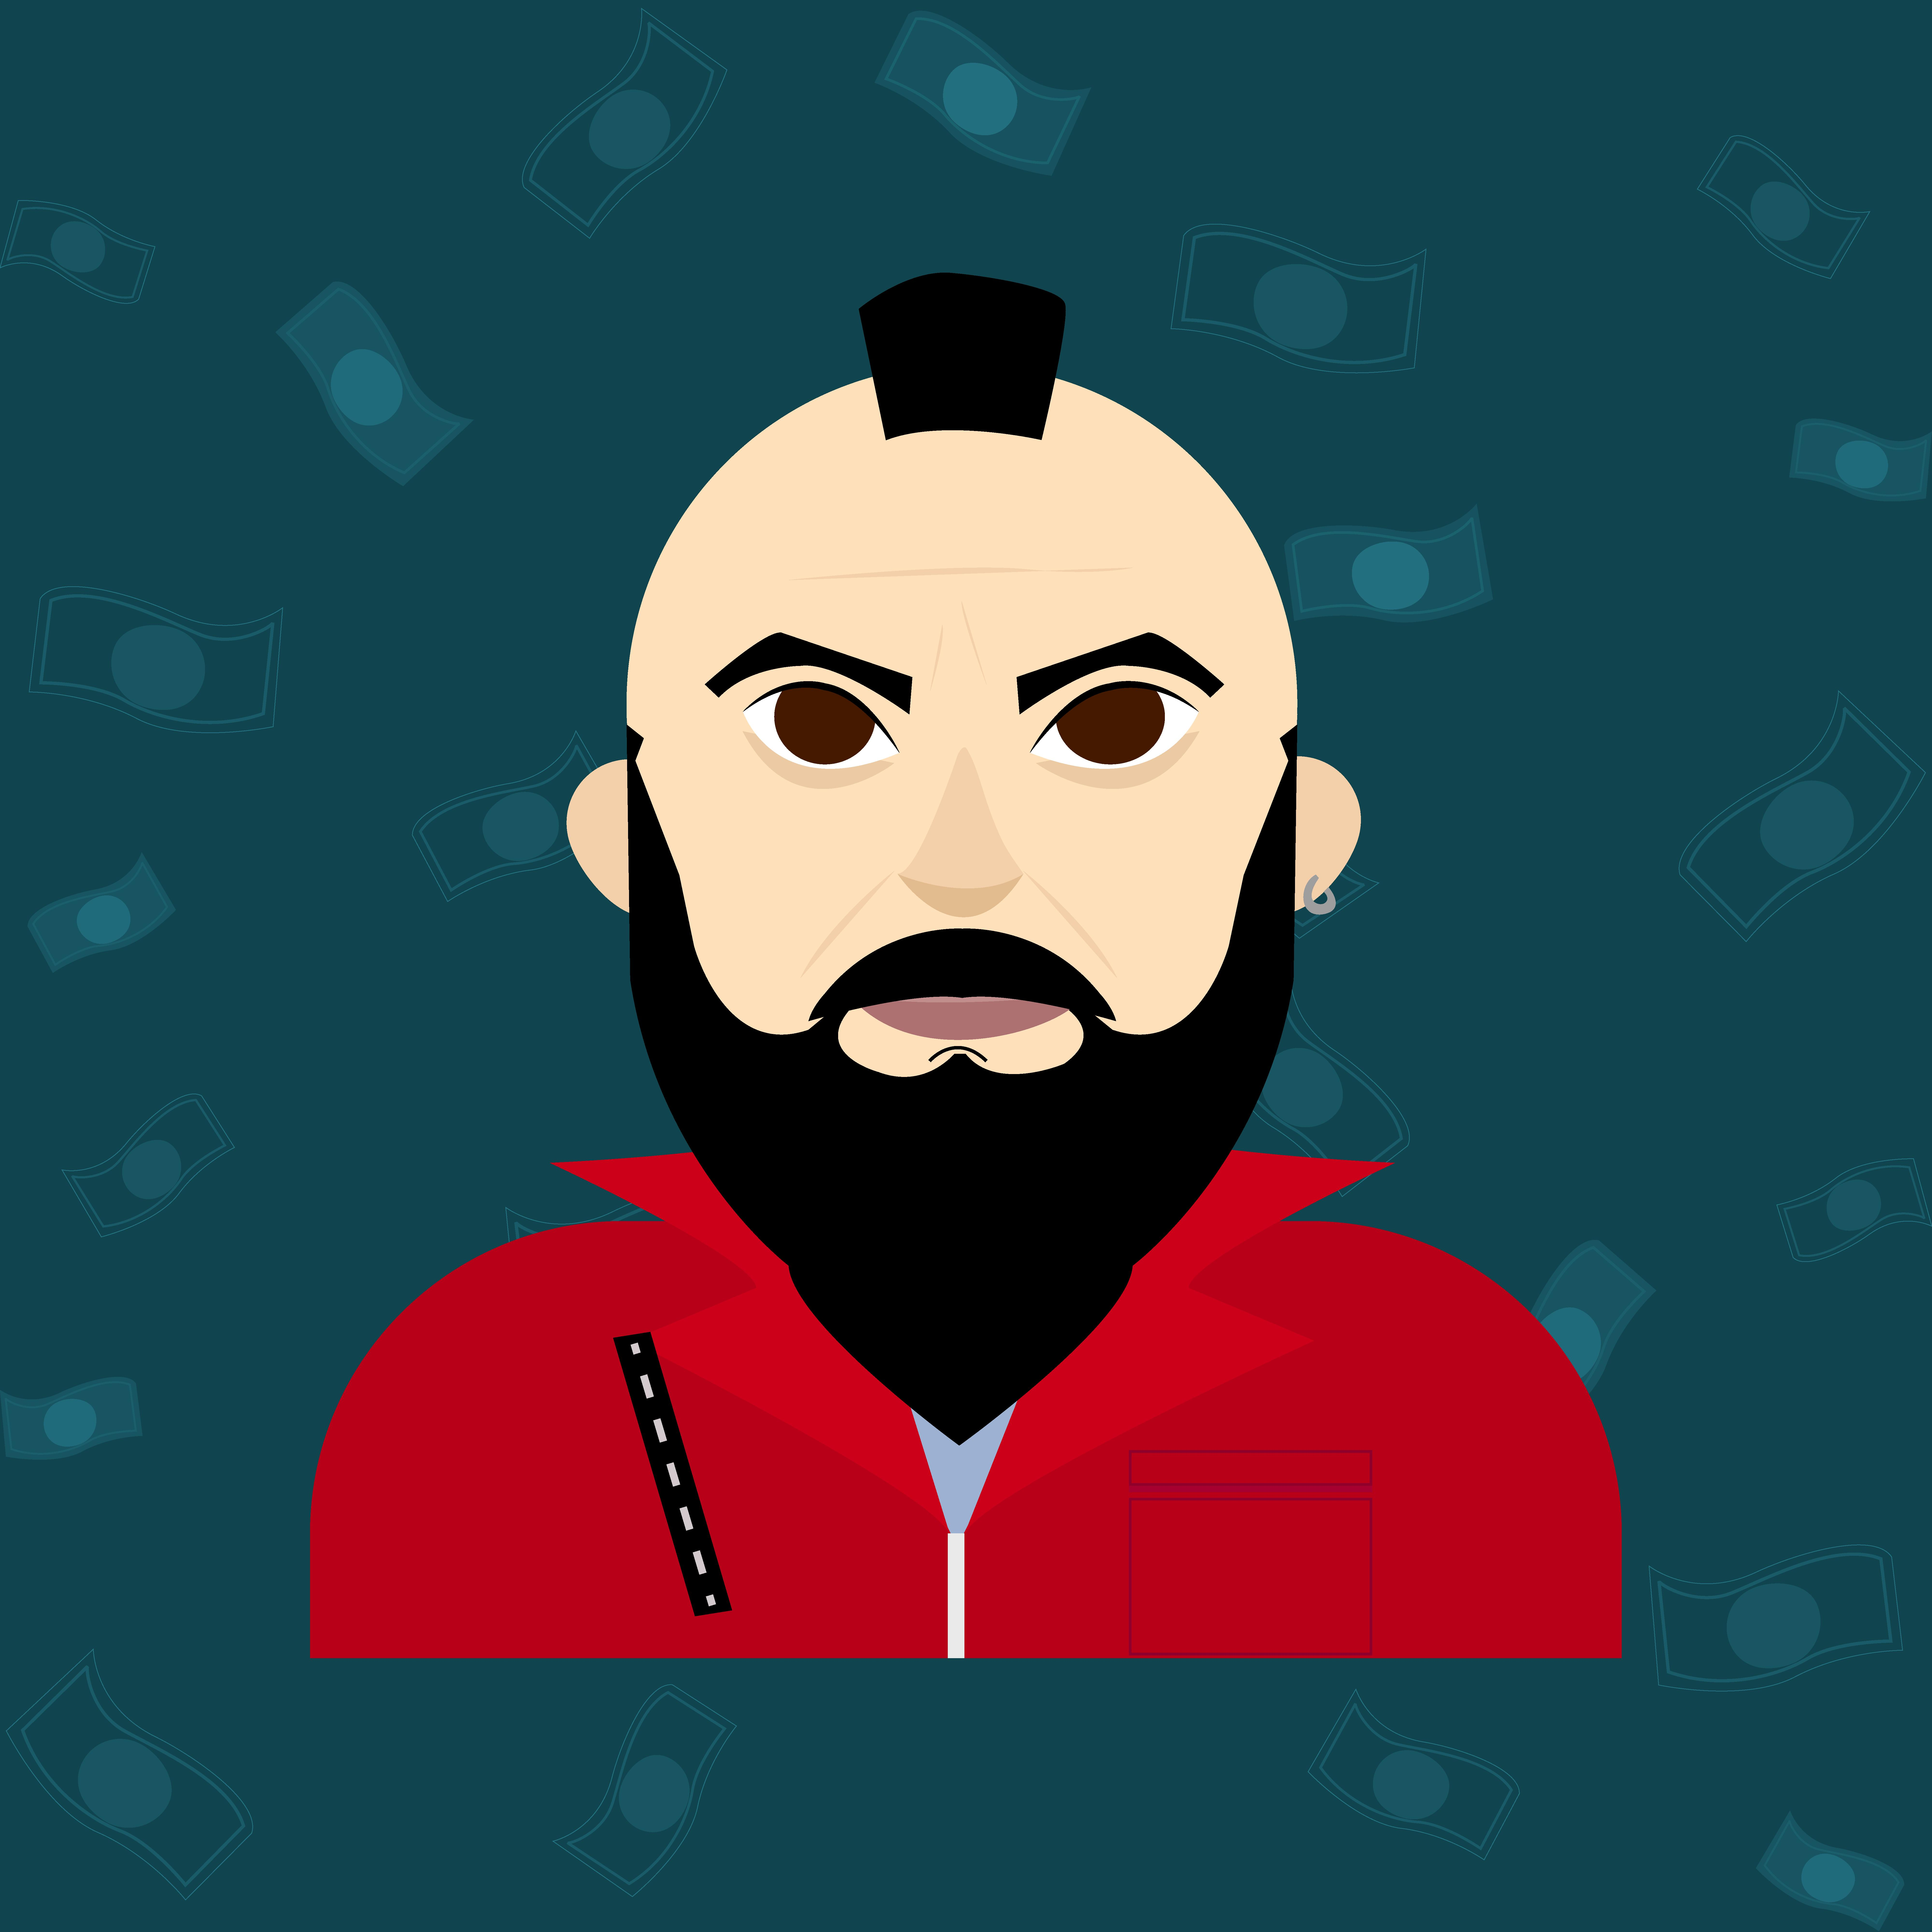 Pin By Kushanthi Hasinika On Money Heist Character Design Netflix Series Character